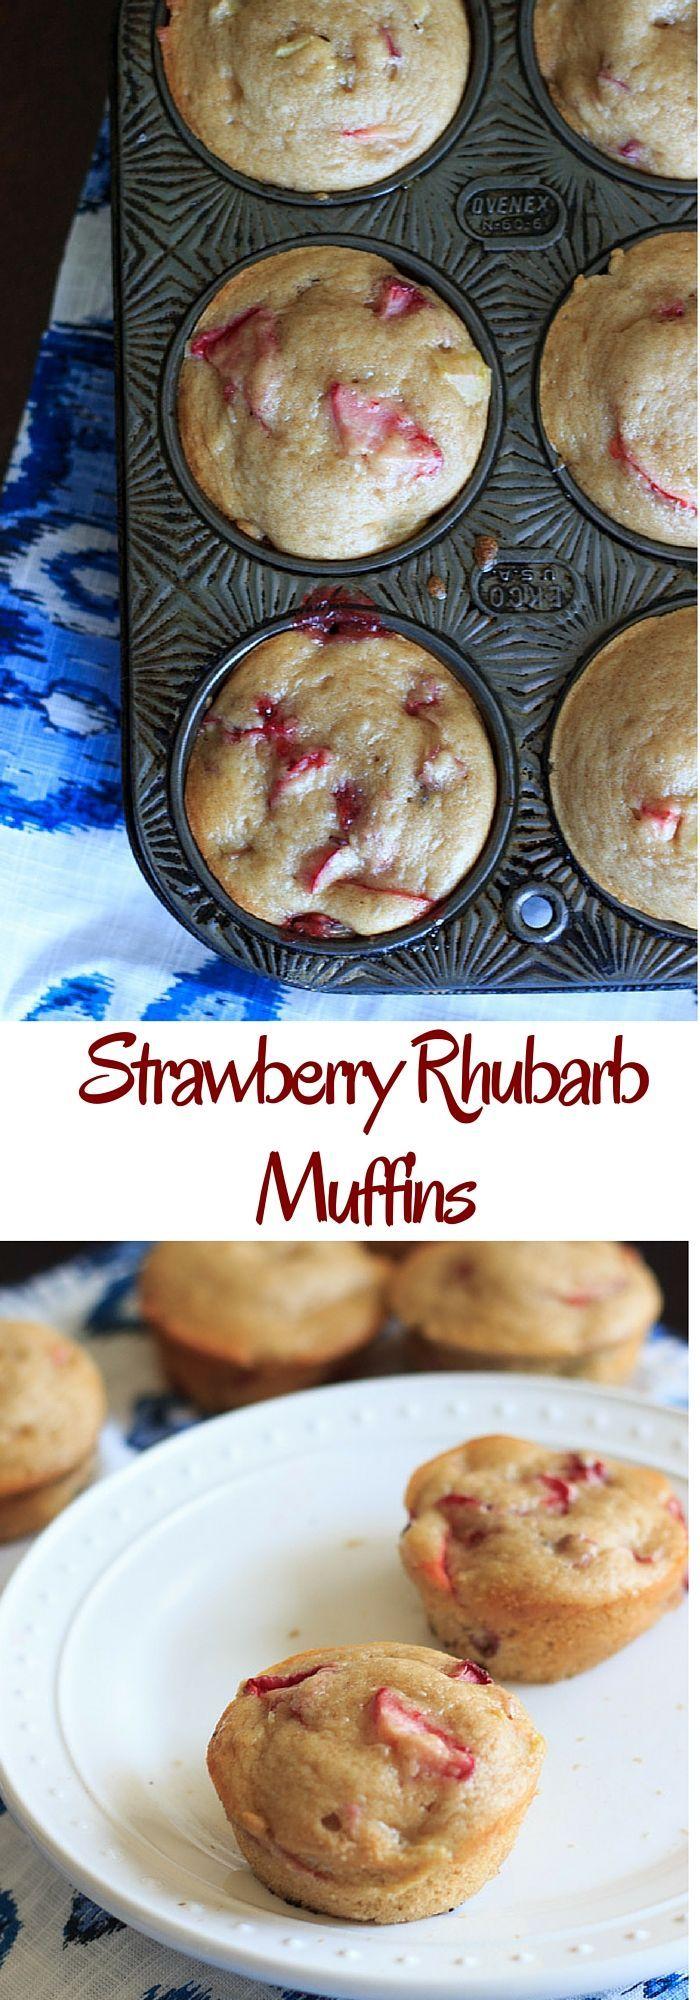 Strawberry rhubarb muffins with a dash of cinnamon, using greek yogurt instead of milk and applesauce instead of oil.